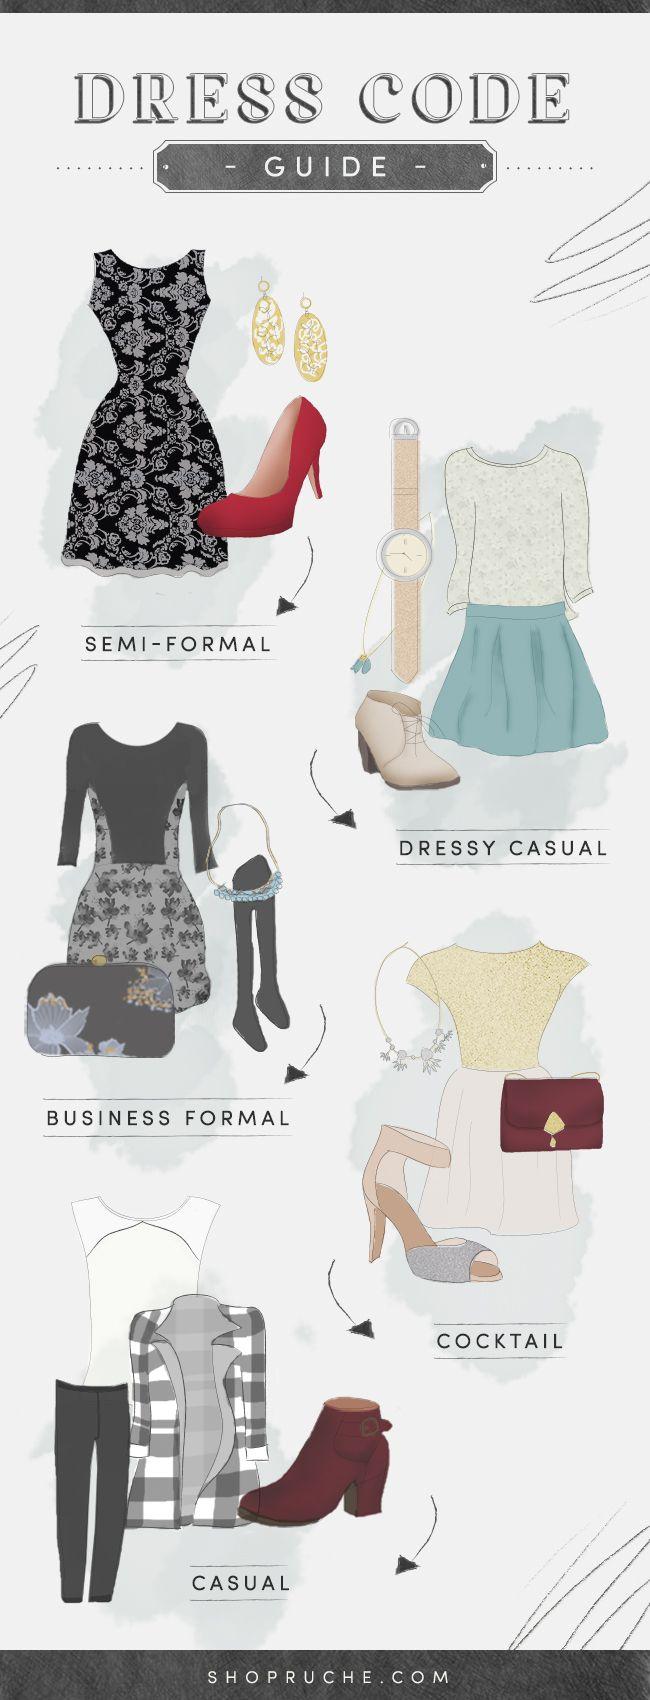 Decode the Dress Code (Ruche) | Dress code, Smoking und Dresscode ...